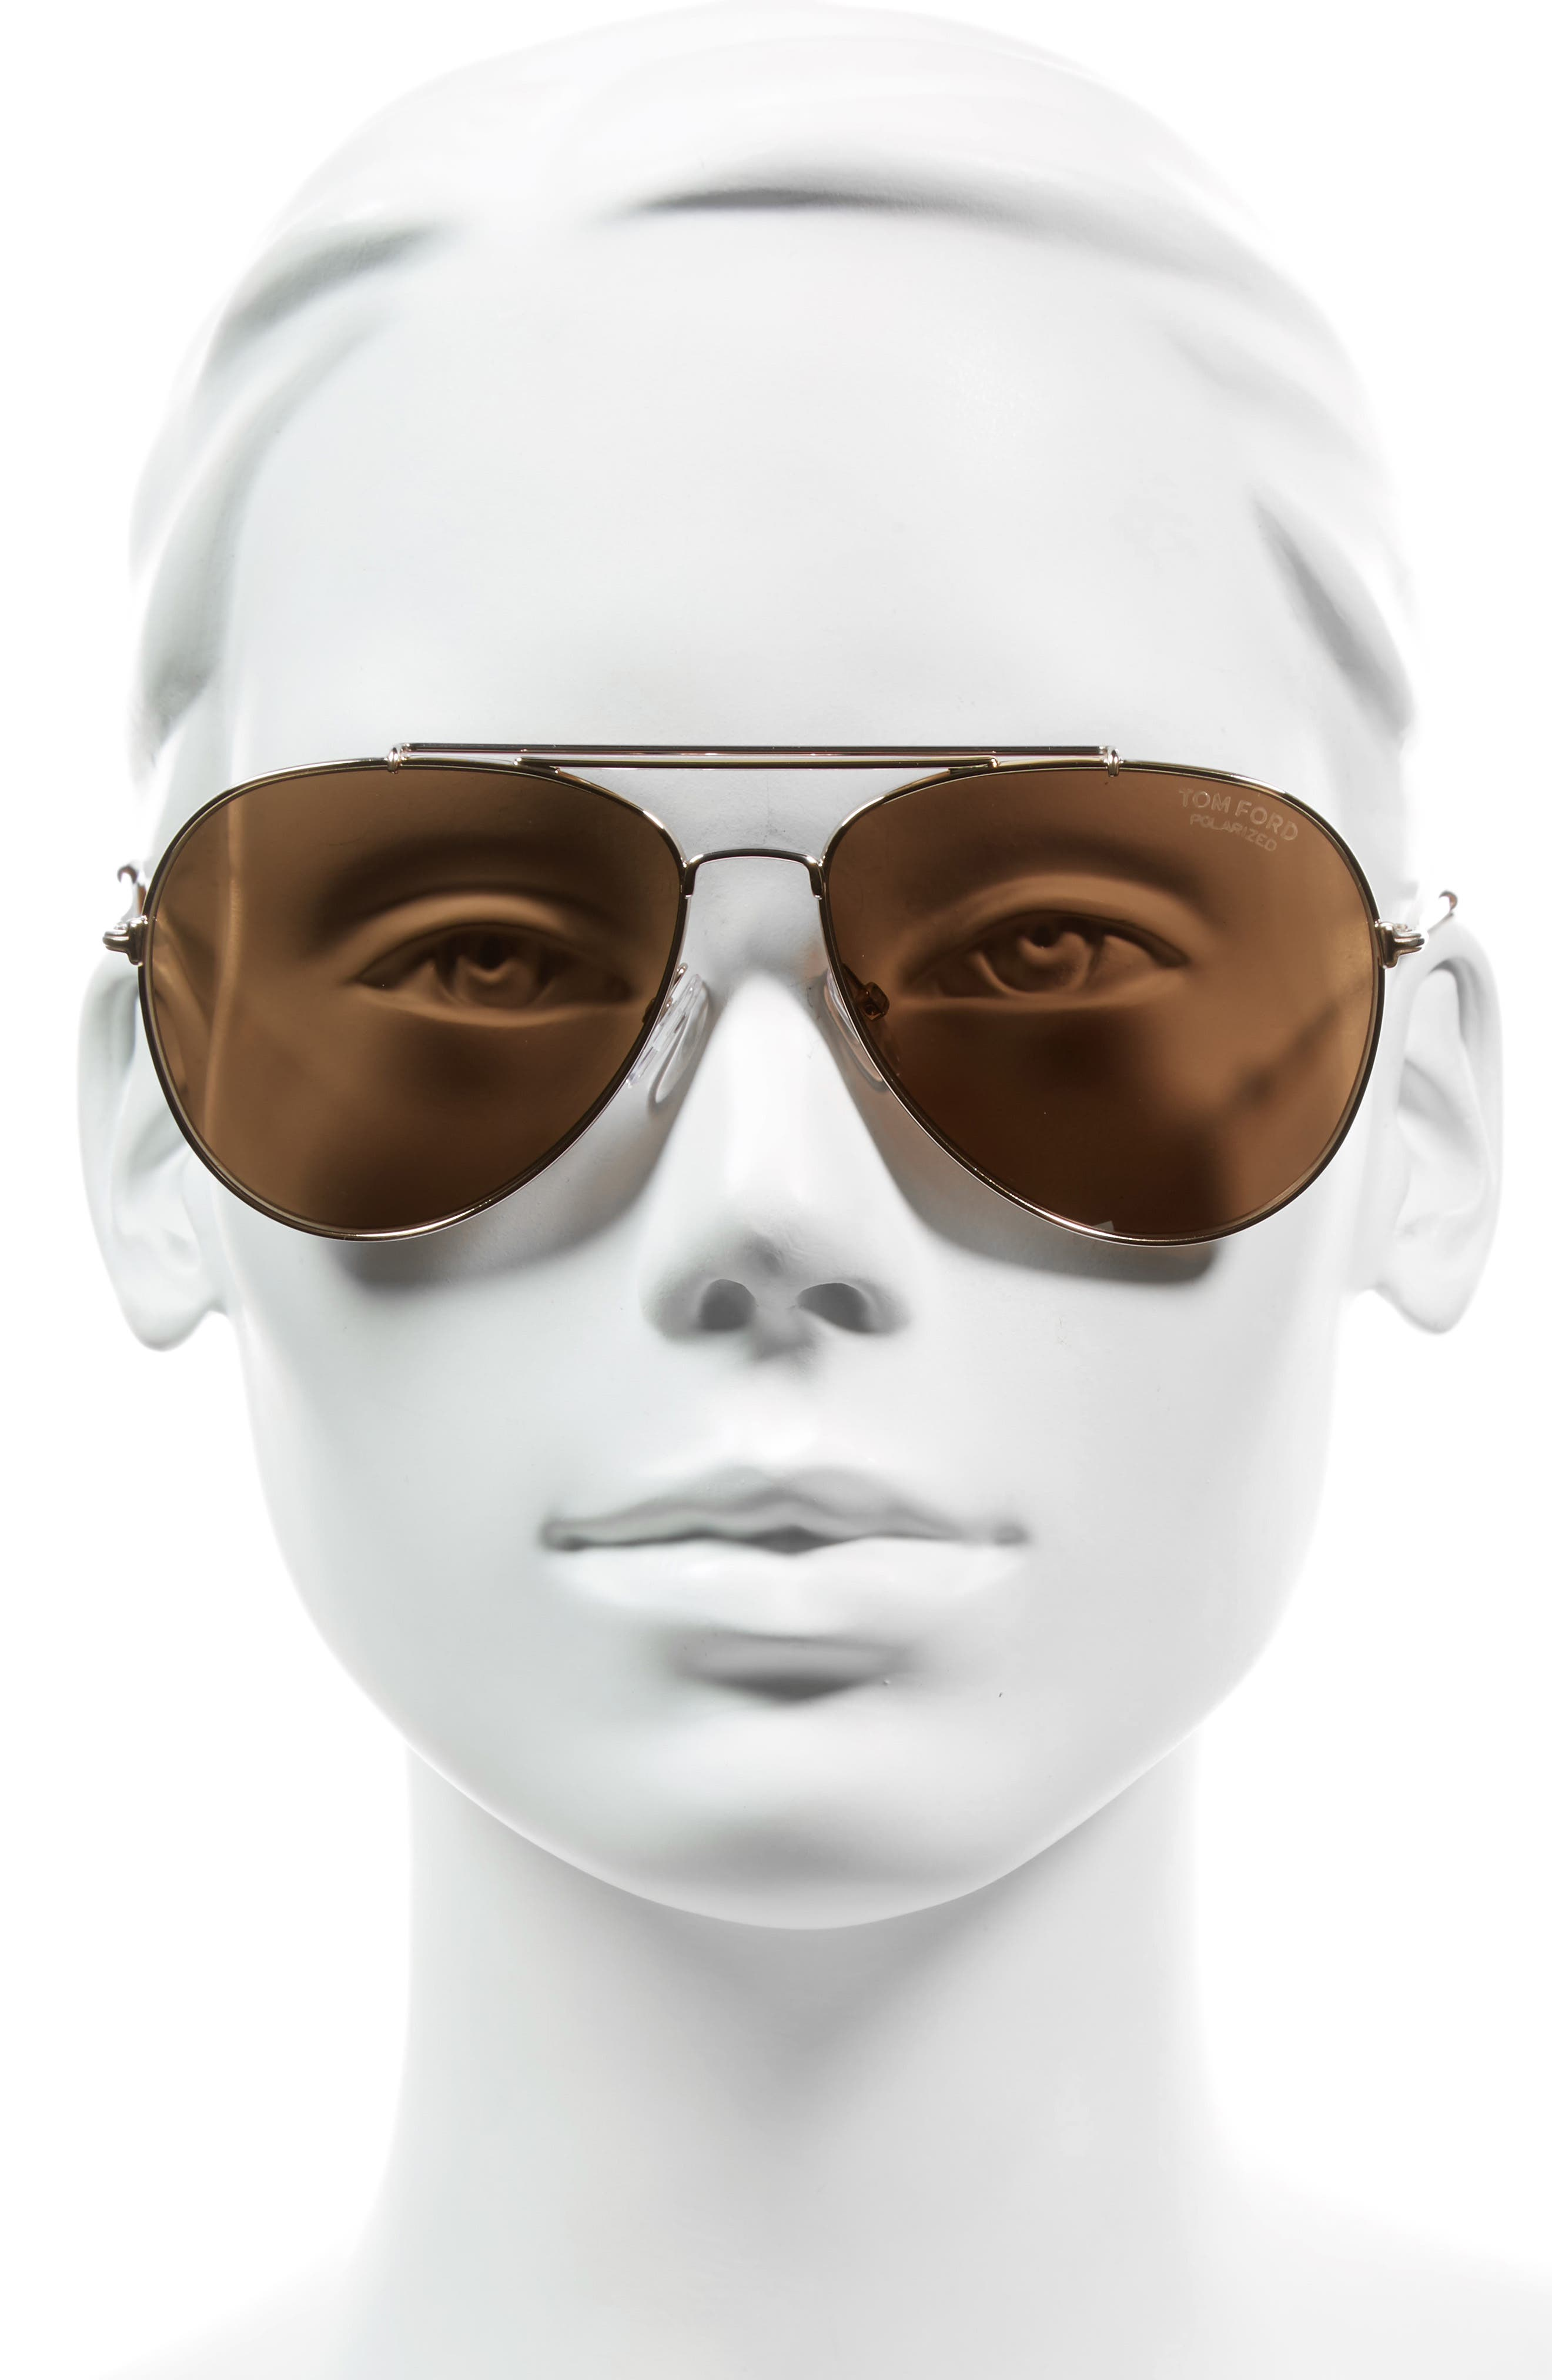 Indiana 58mm Polarized Aviator Sunglasses,                             Alternate thumbnail 2, color,                             Rose Gold/ Blonde/ Brown Polar